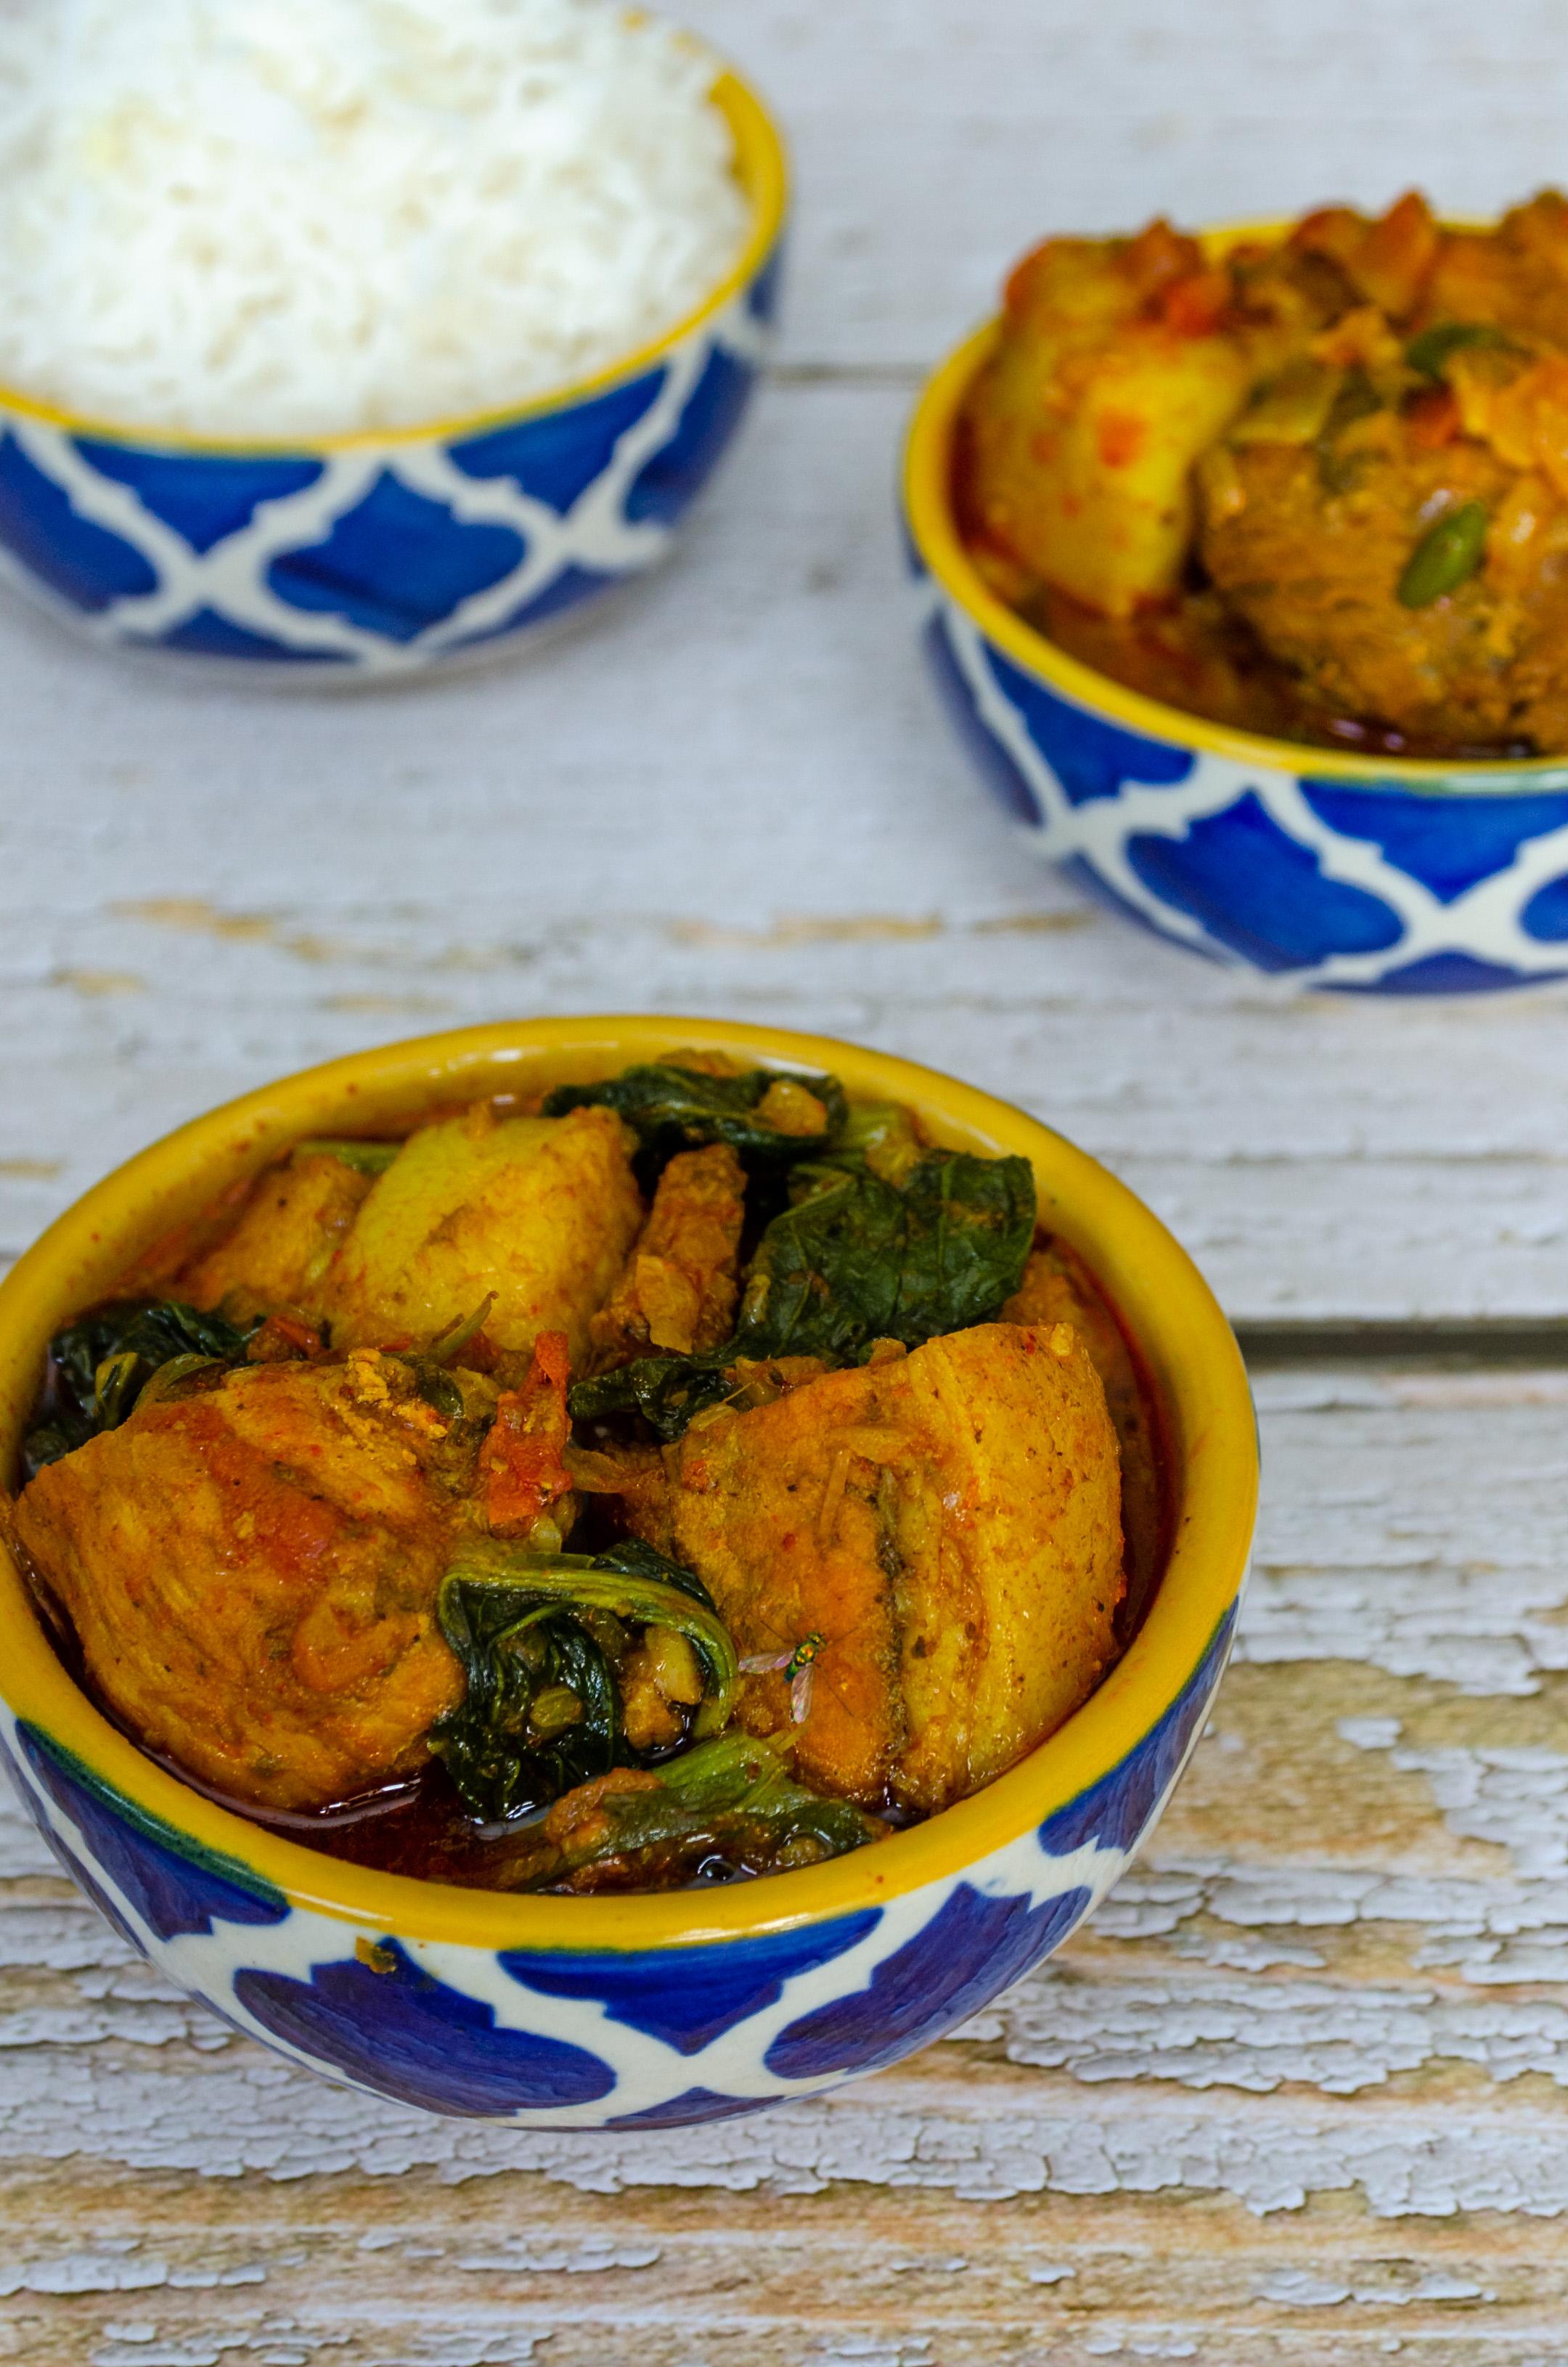 Pork Lai Xaak, Pork Mustard Green, Let's Poaka. Kolkata